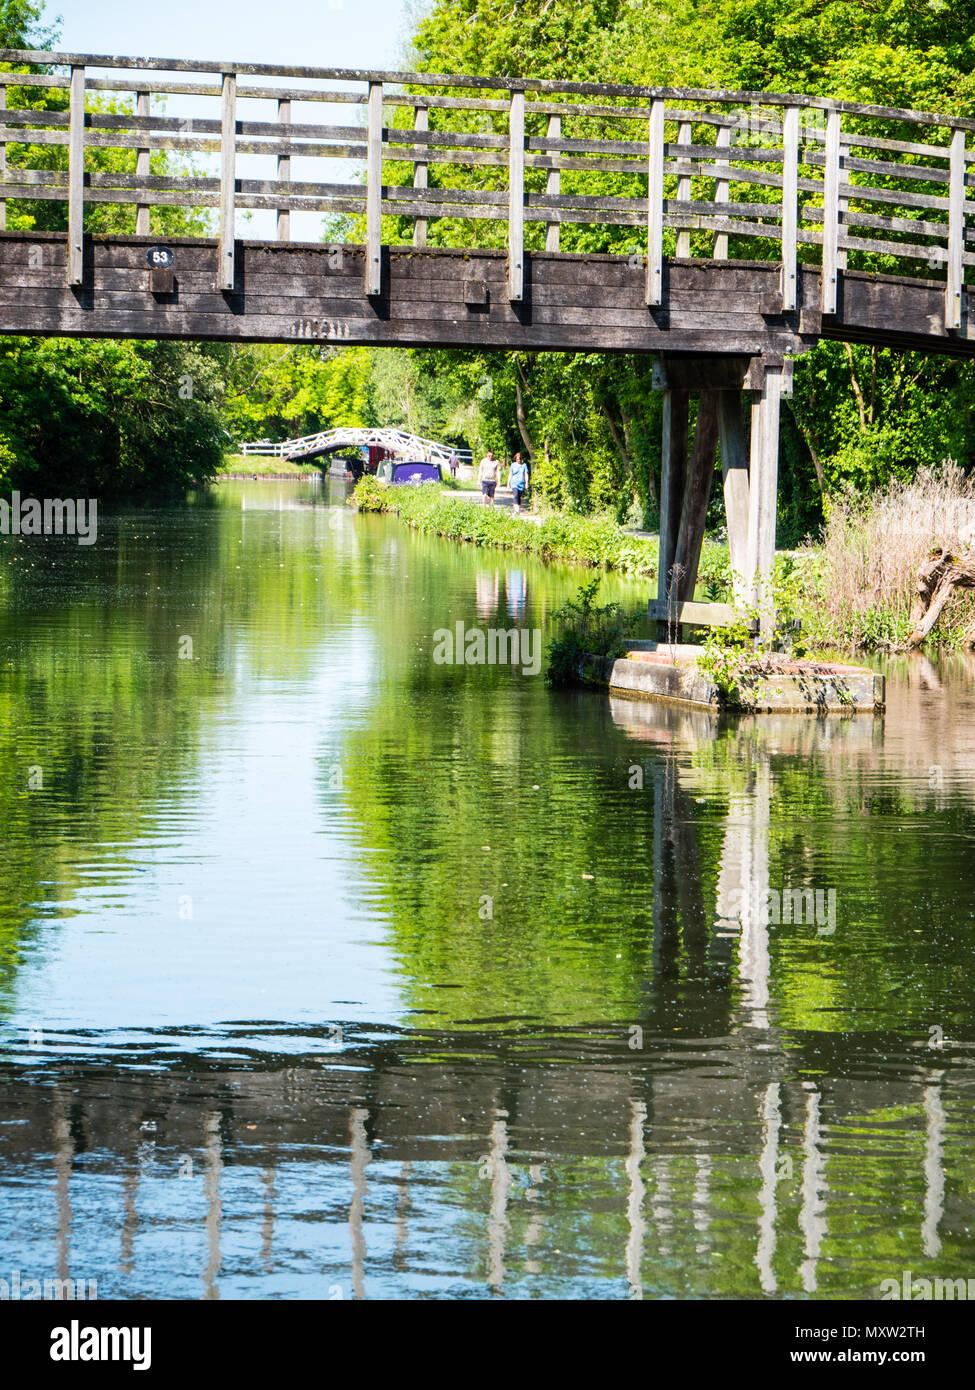 Greenham Mill Passerelle, Newbury, rivière Kennett, Berkshire, Angleterre, RU, FR. Photo Stock